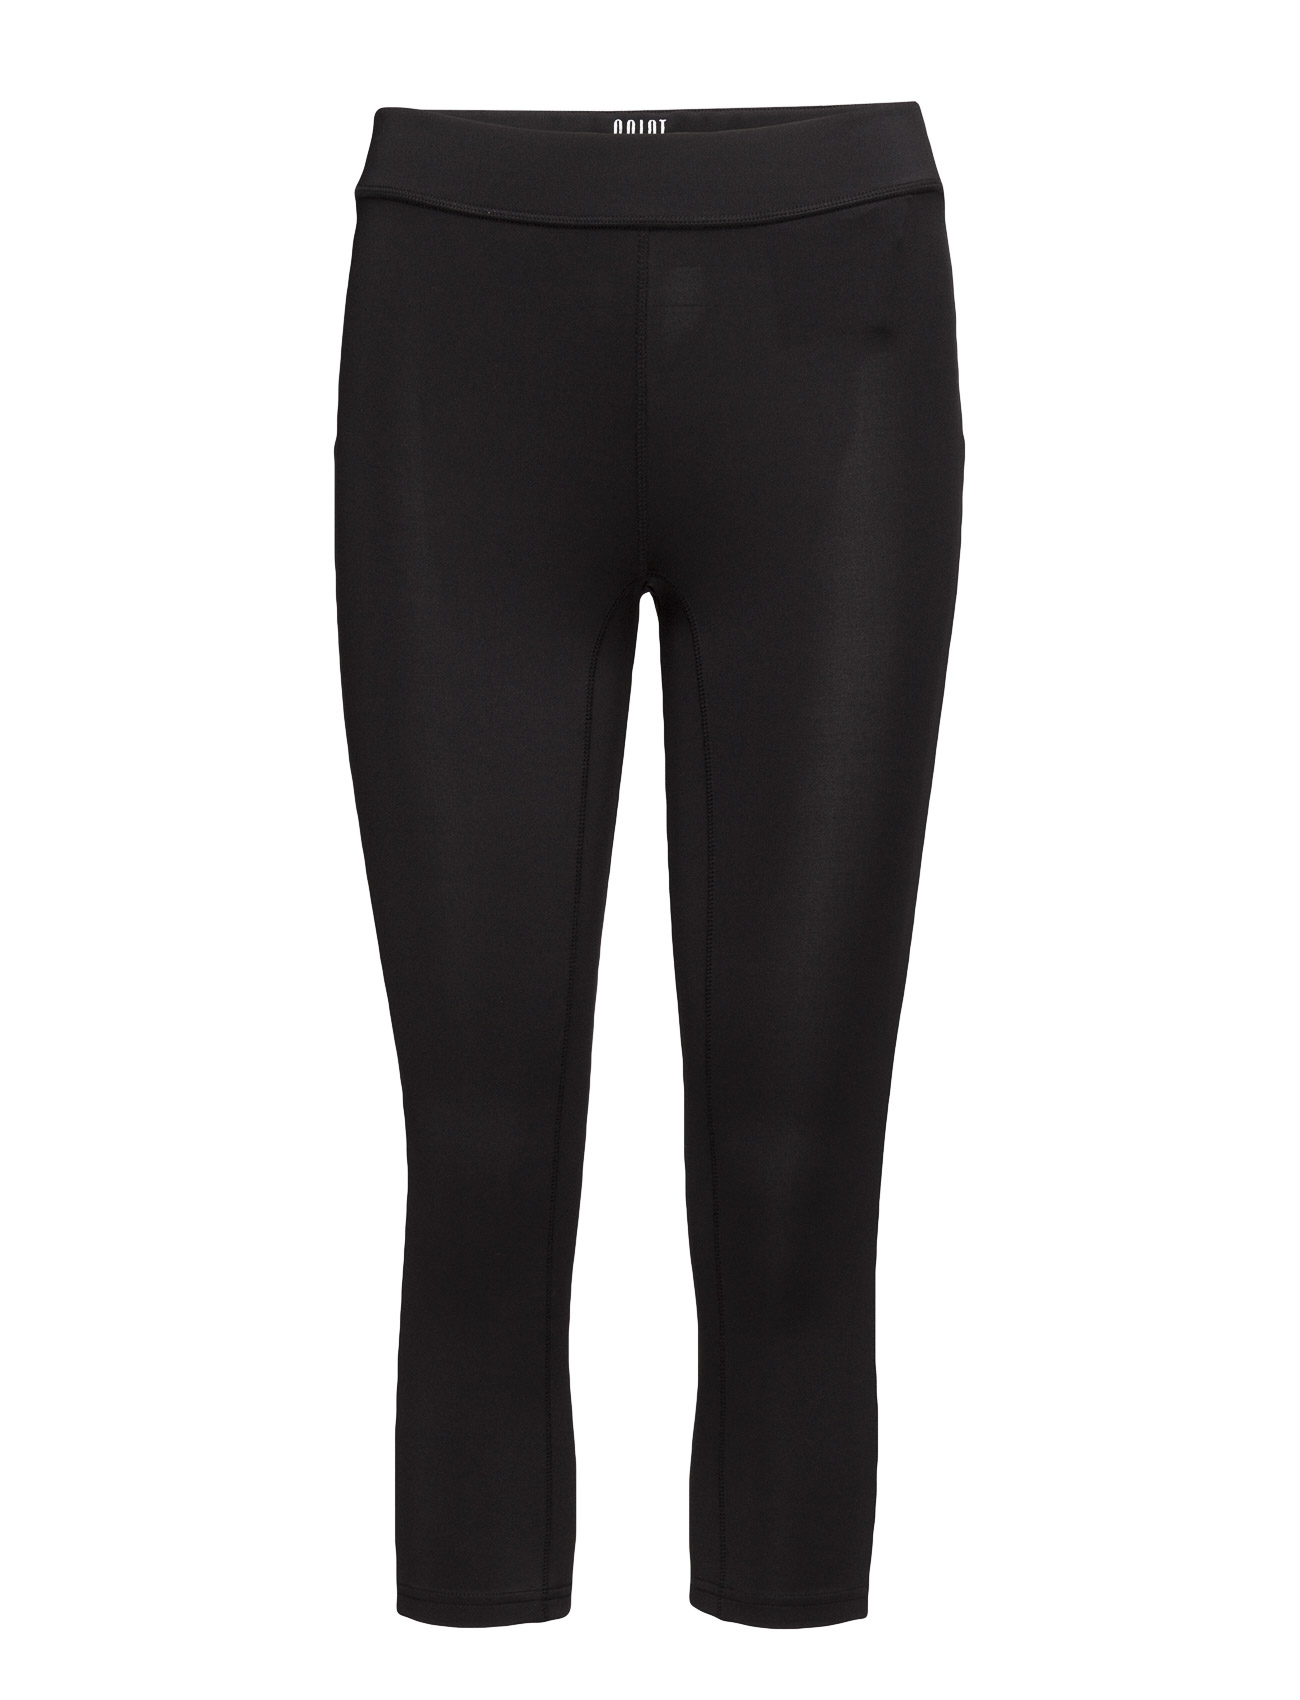 Printed Capri Tights Saint Tropez Trænings leggings til Kvinder i